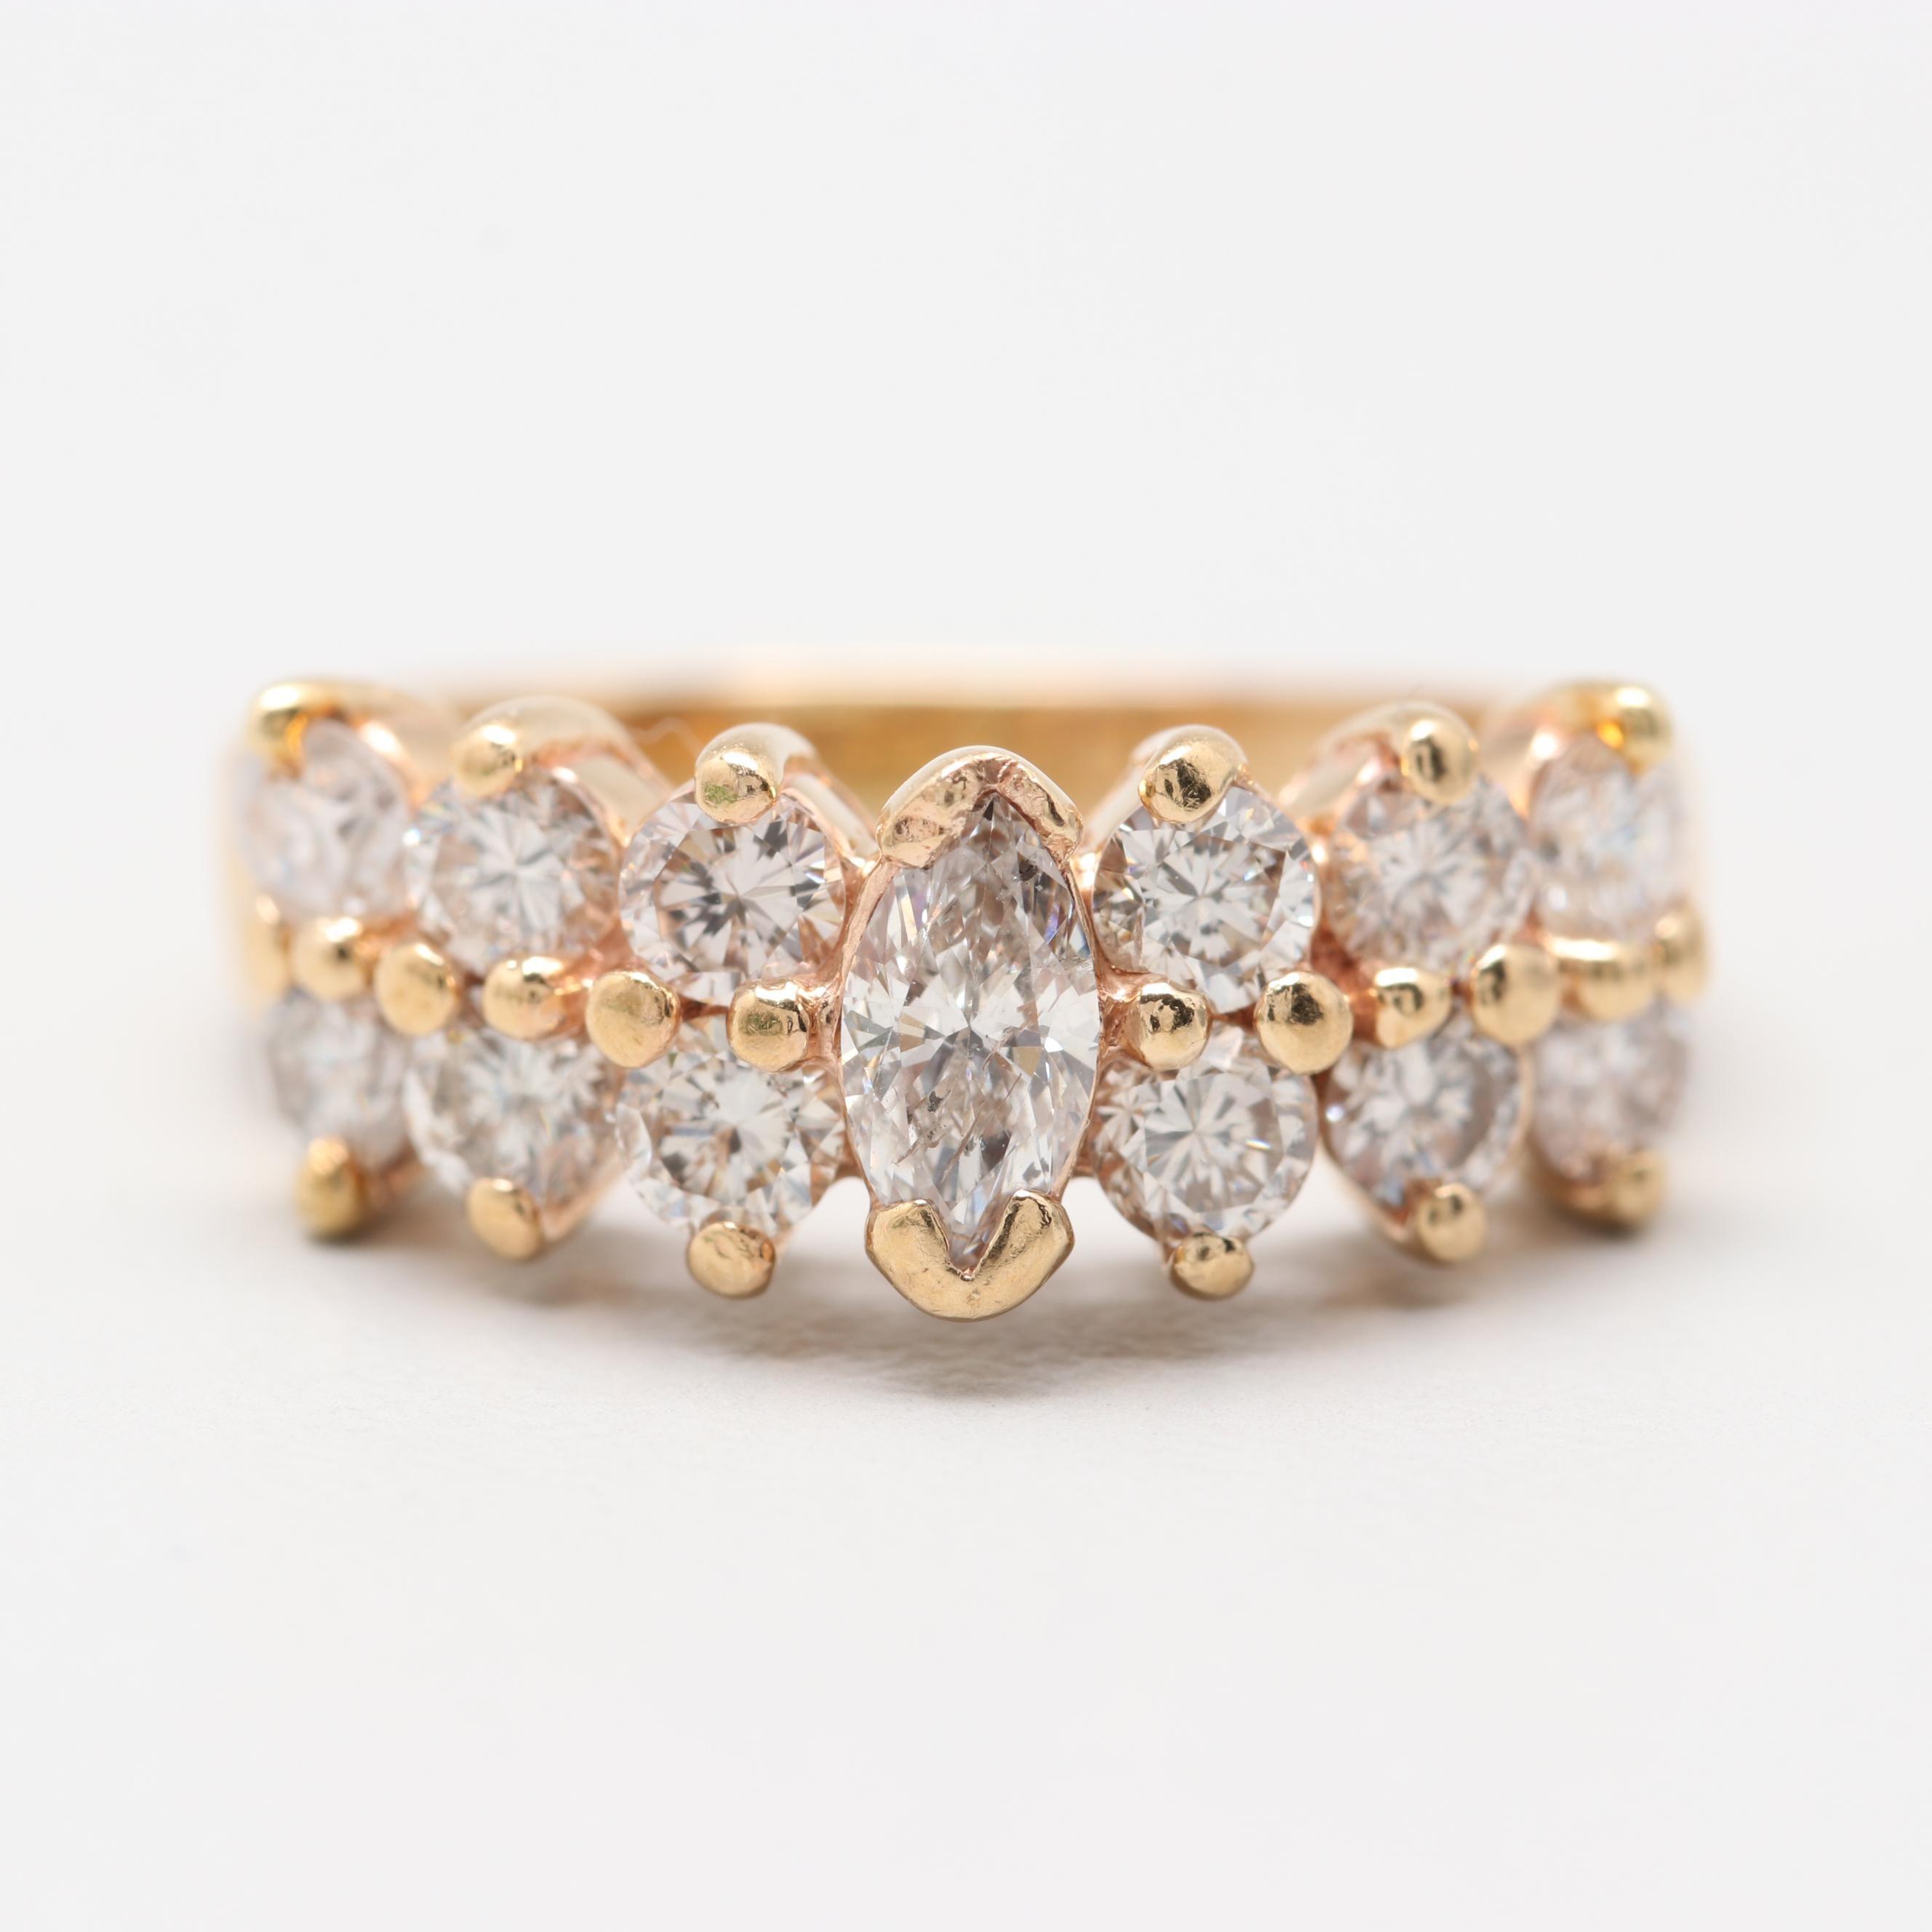 EFFY 14K Yellow Gold 1.07 CTW Diamond Ring